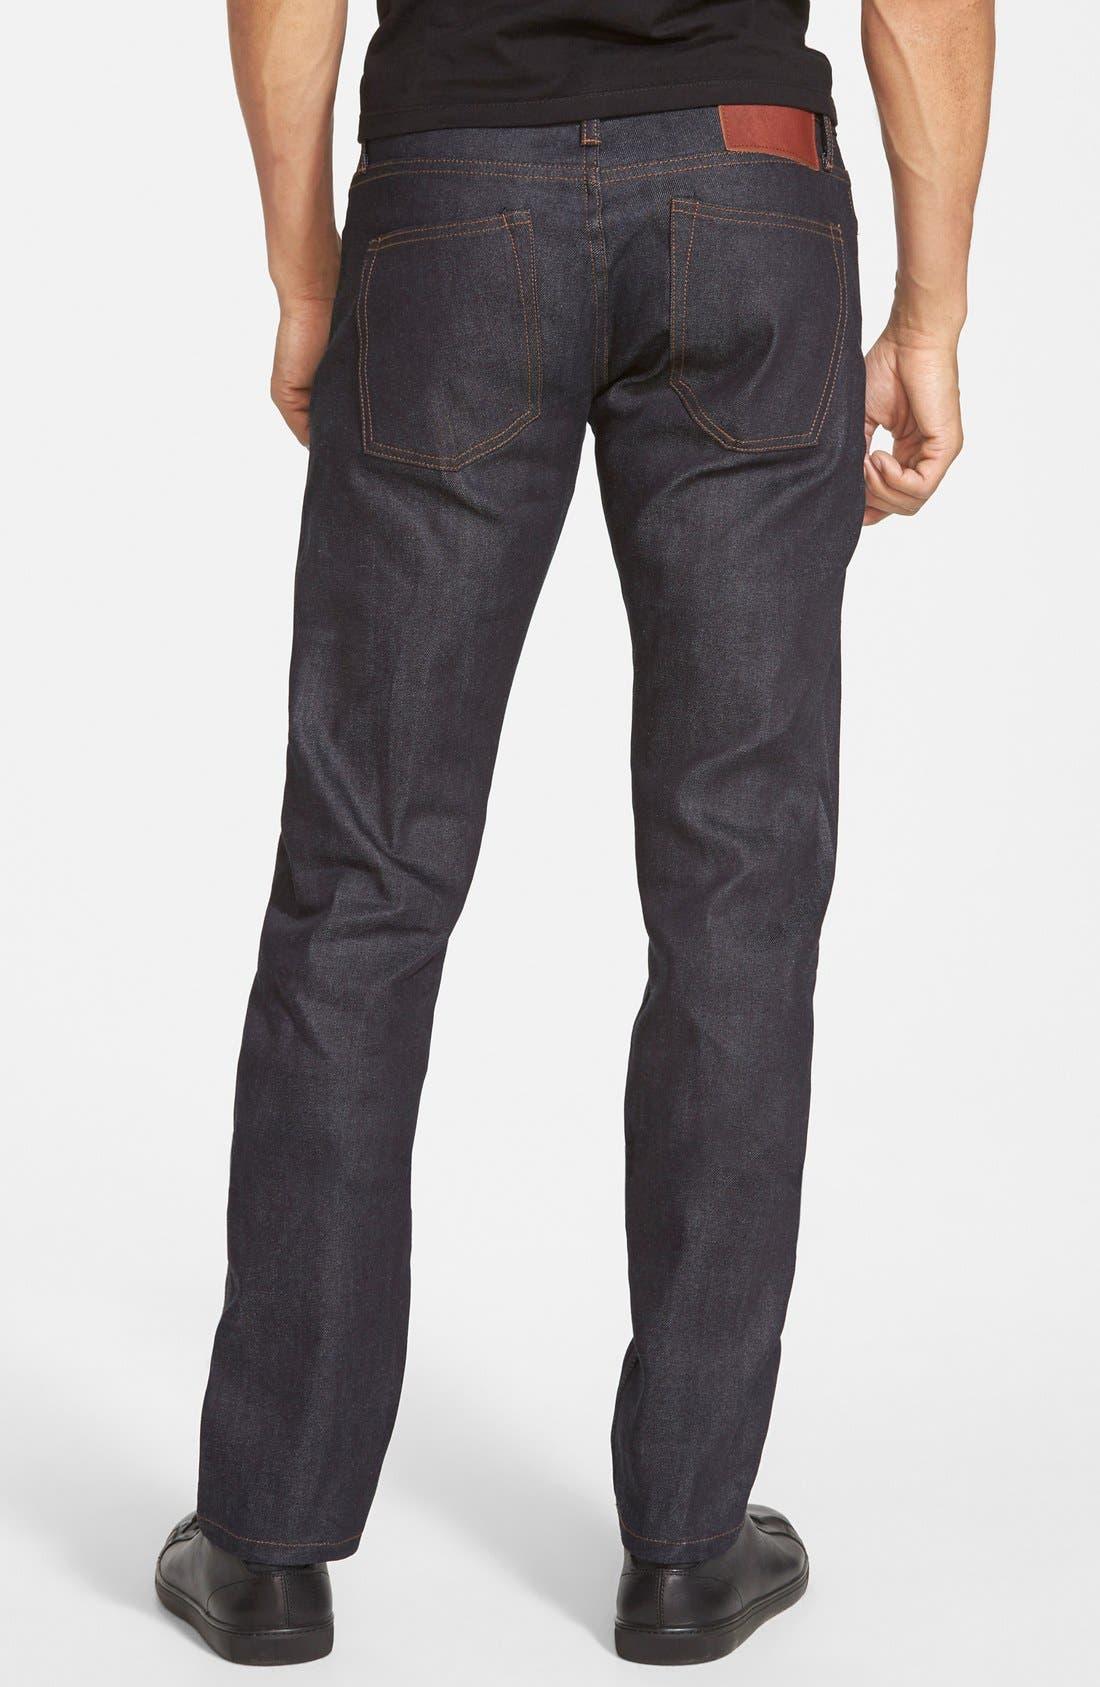 'UB122' Skinny Fit Raw Selvedge Jeans,                             Alternate thumbnail 3, color,                             401